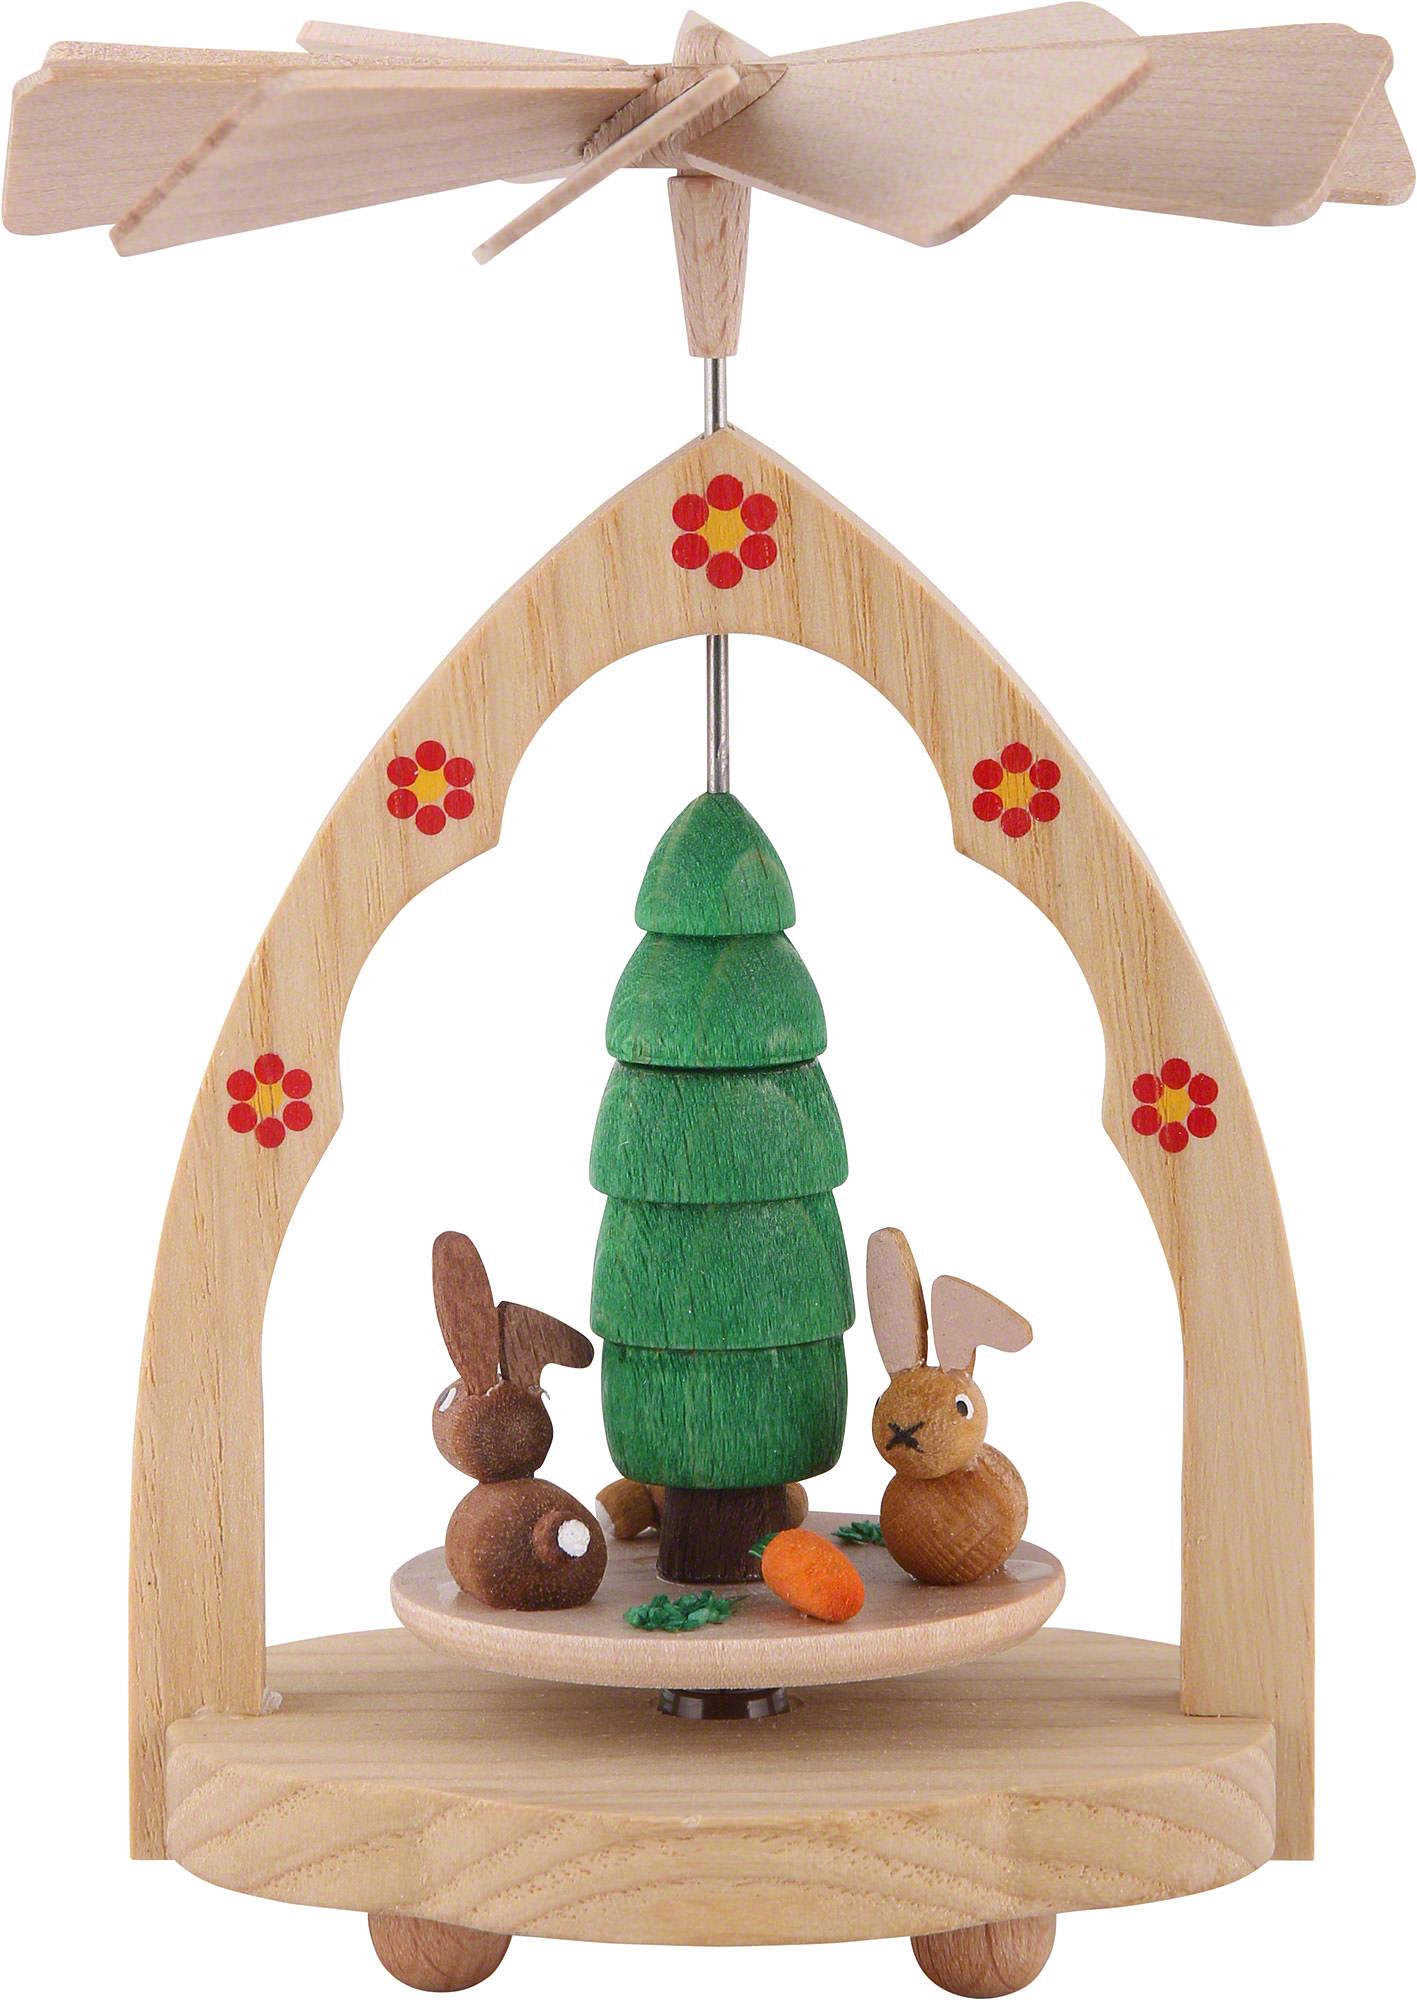 richard glsser gmbh seiffen - German Christmas Decorations Wholesale